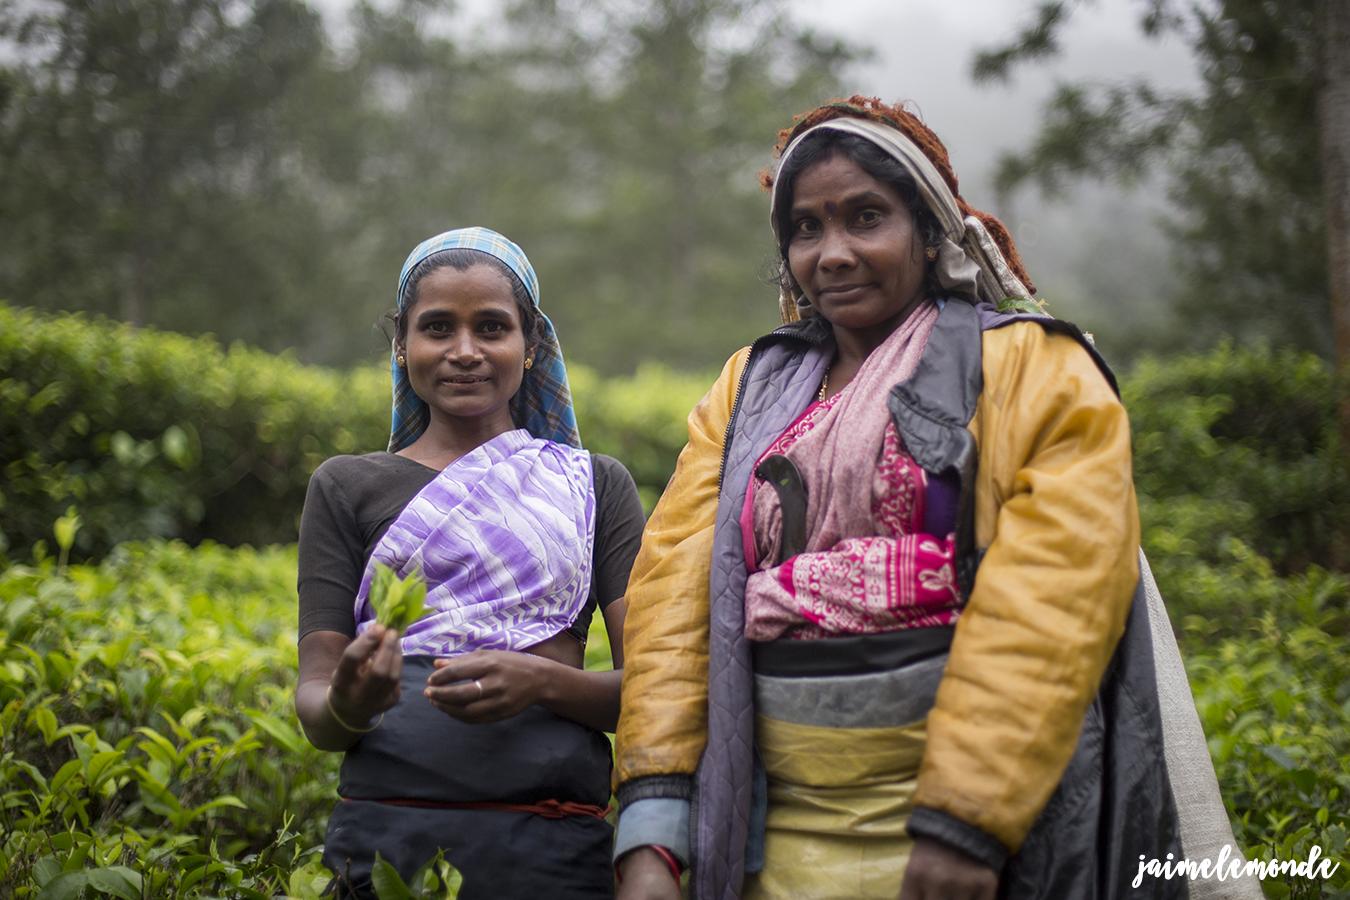 Portraits de voyage au Sri Lanka ©jaimelemonde (6)